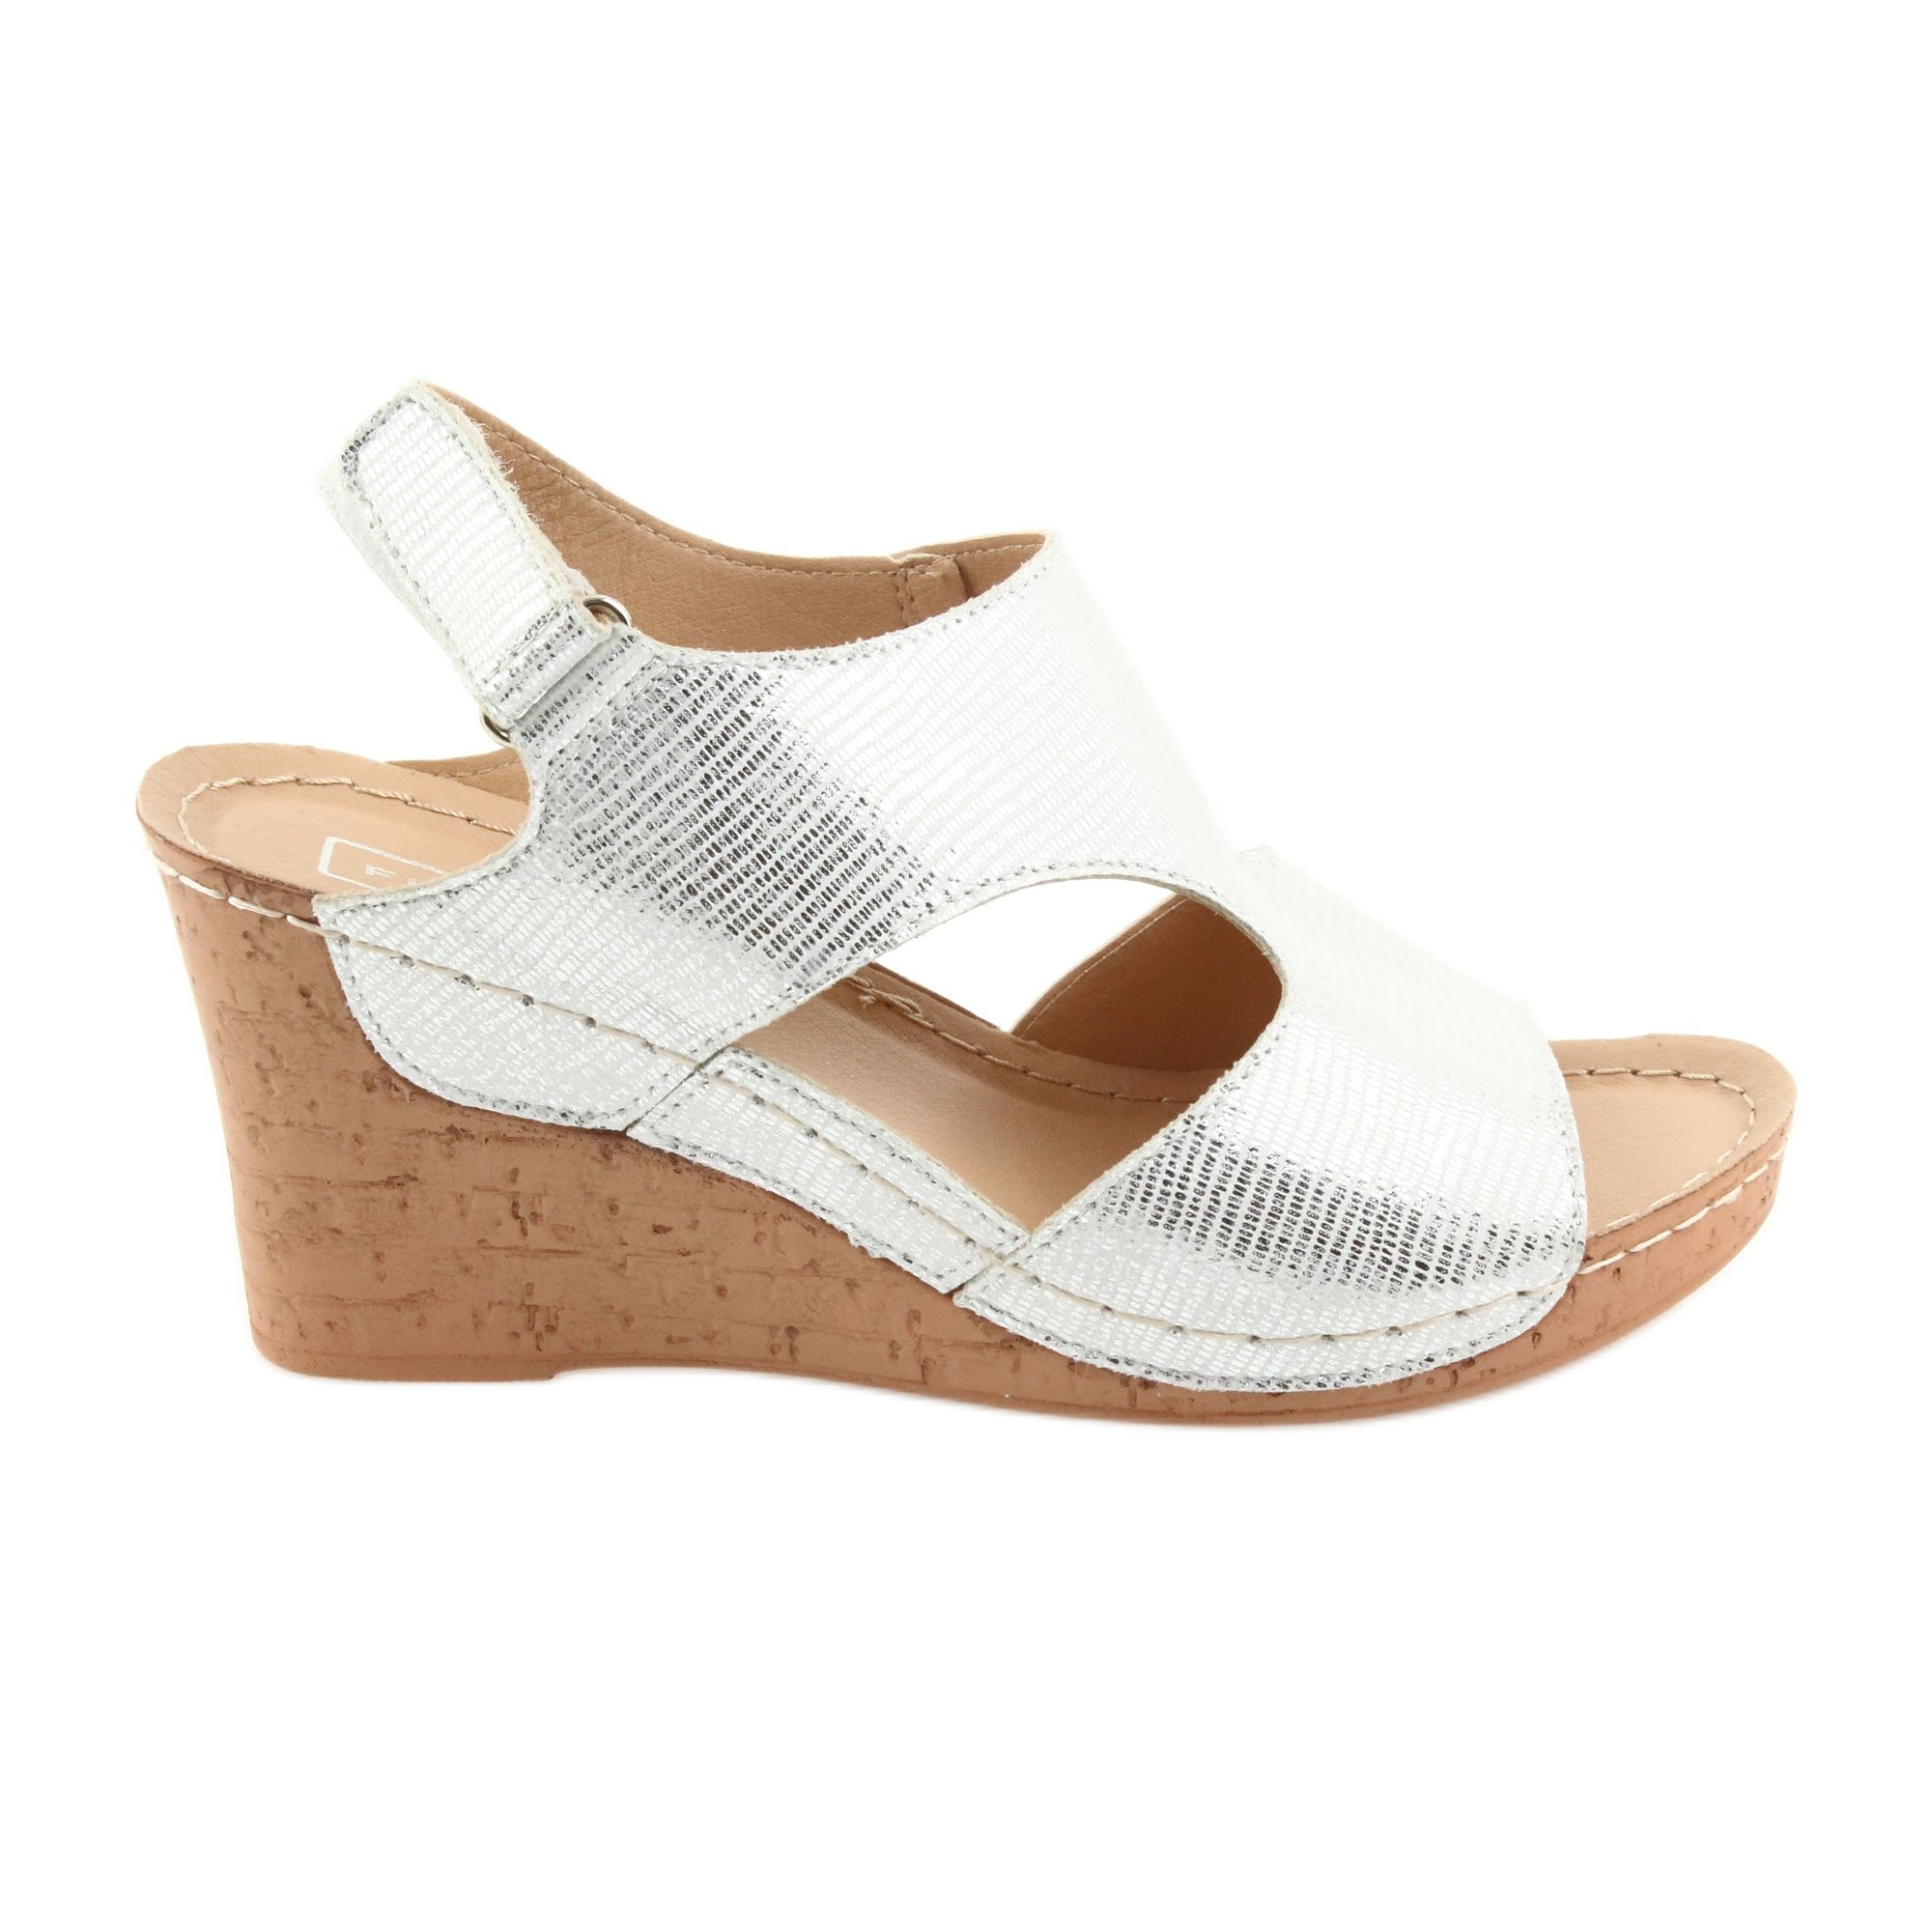 Filippo Sandaly Na Koturnie Srebrne 785 Biale Szare Wedges Shoes Cork Wedge